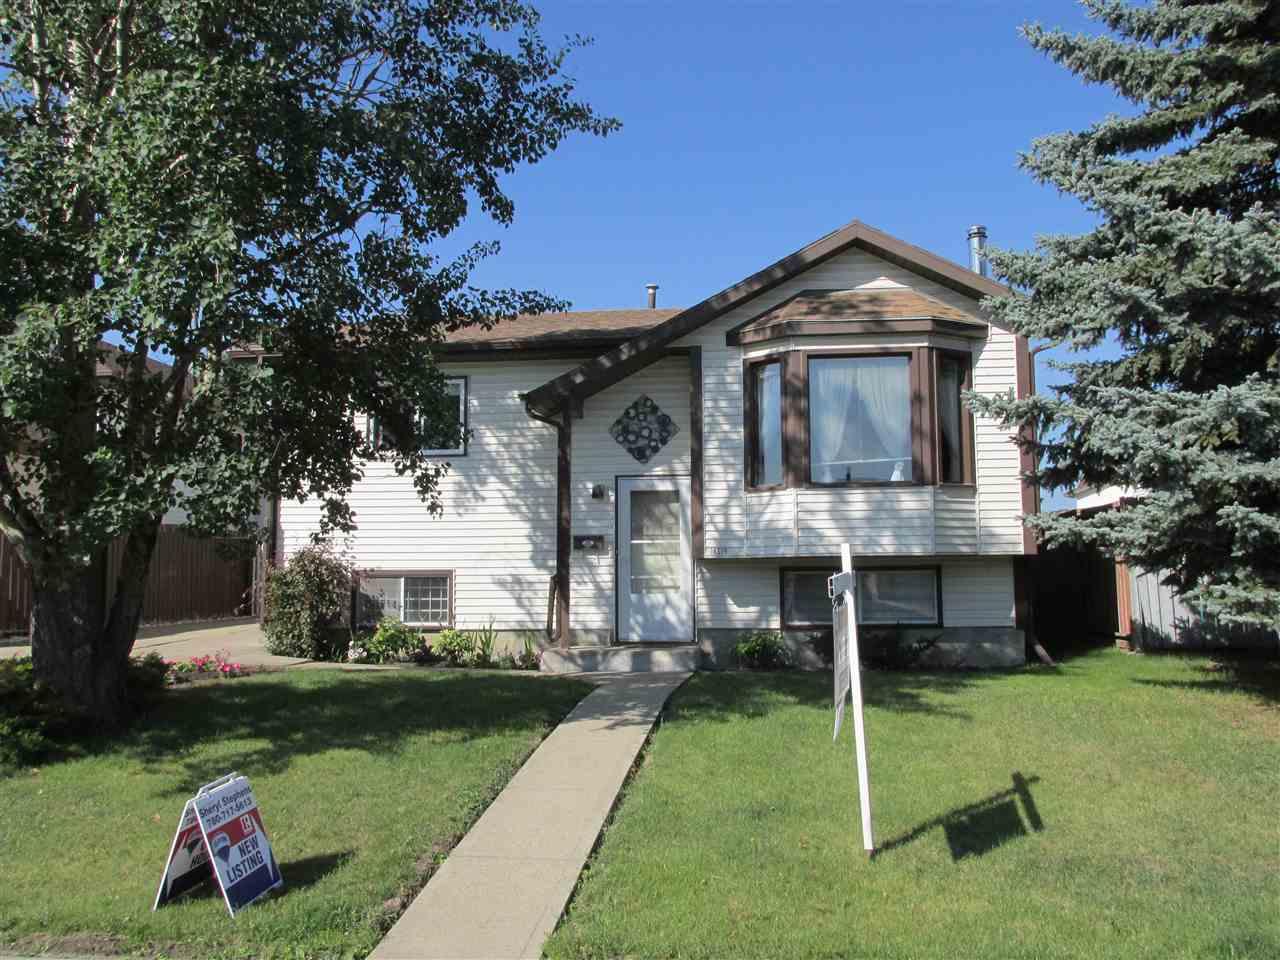 14516 32 Street, 4 bed, 2 bath, at $324,900